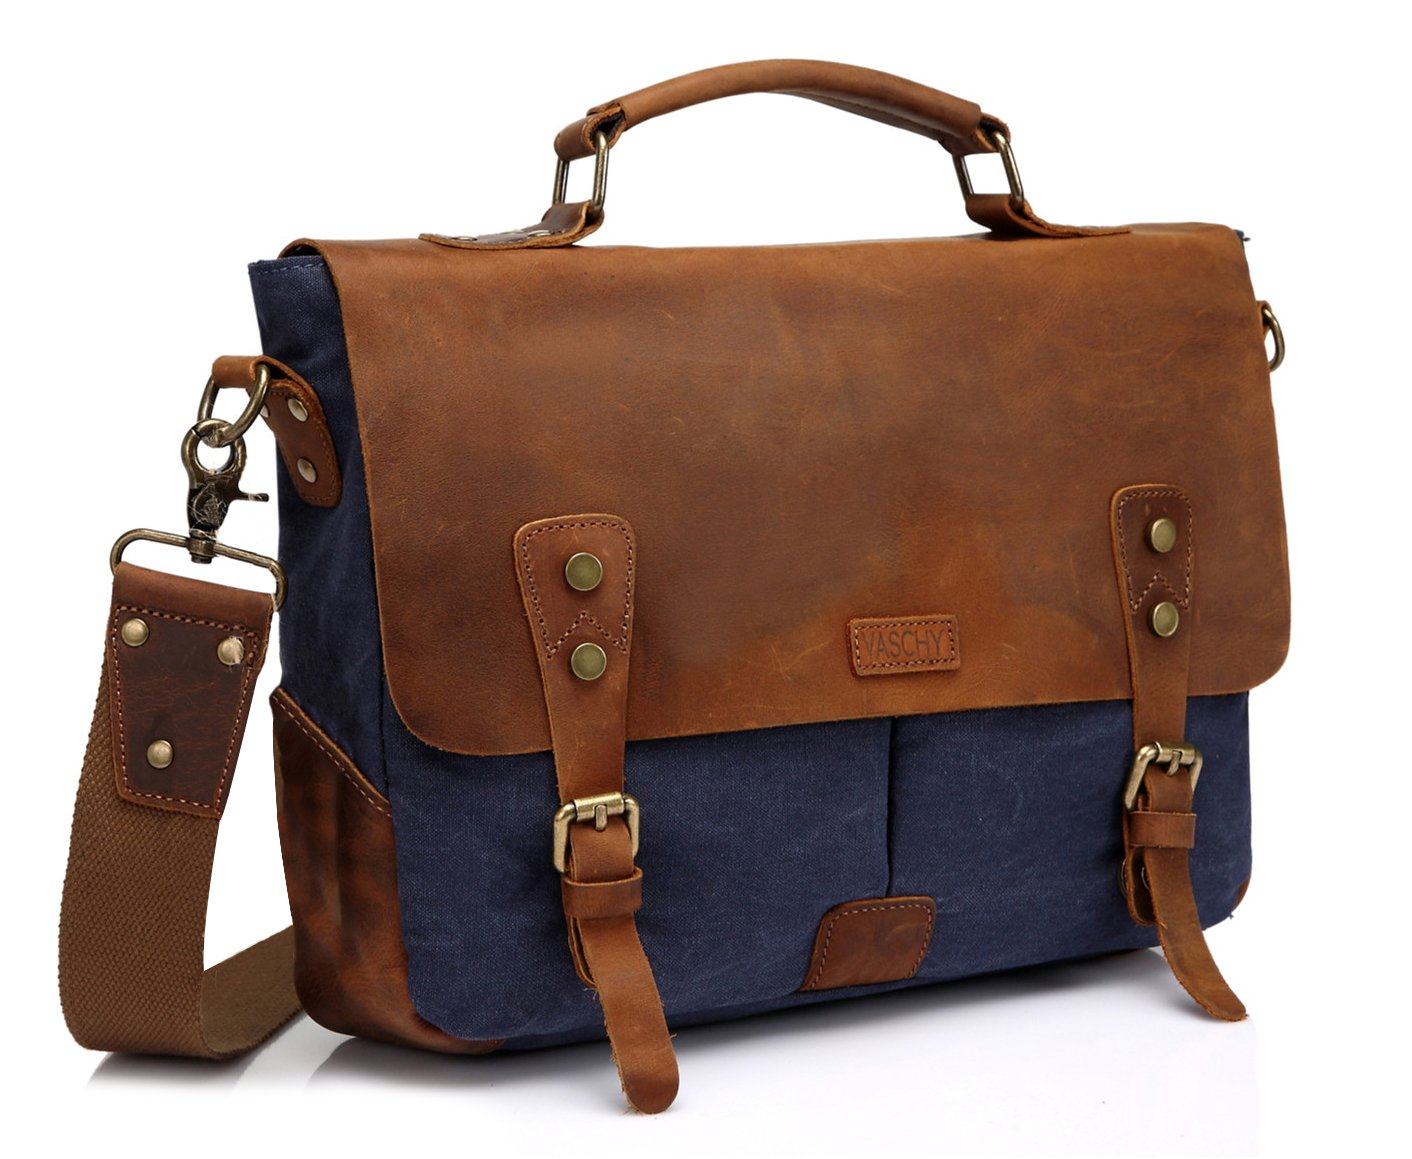 Vaschy Casual Genuine Leather Canvas messenger Bag Notebook Shoulder Bag Bookbag with Detachable Strap